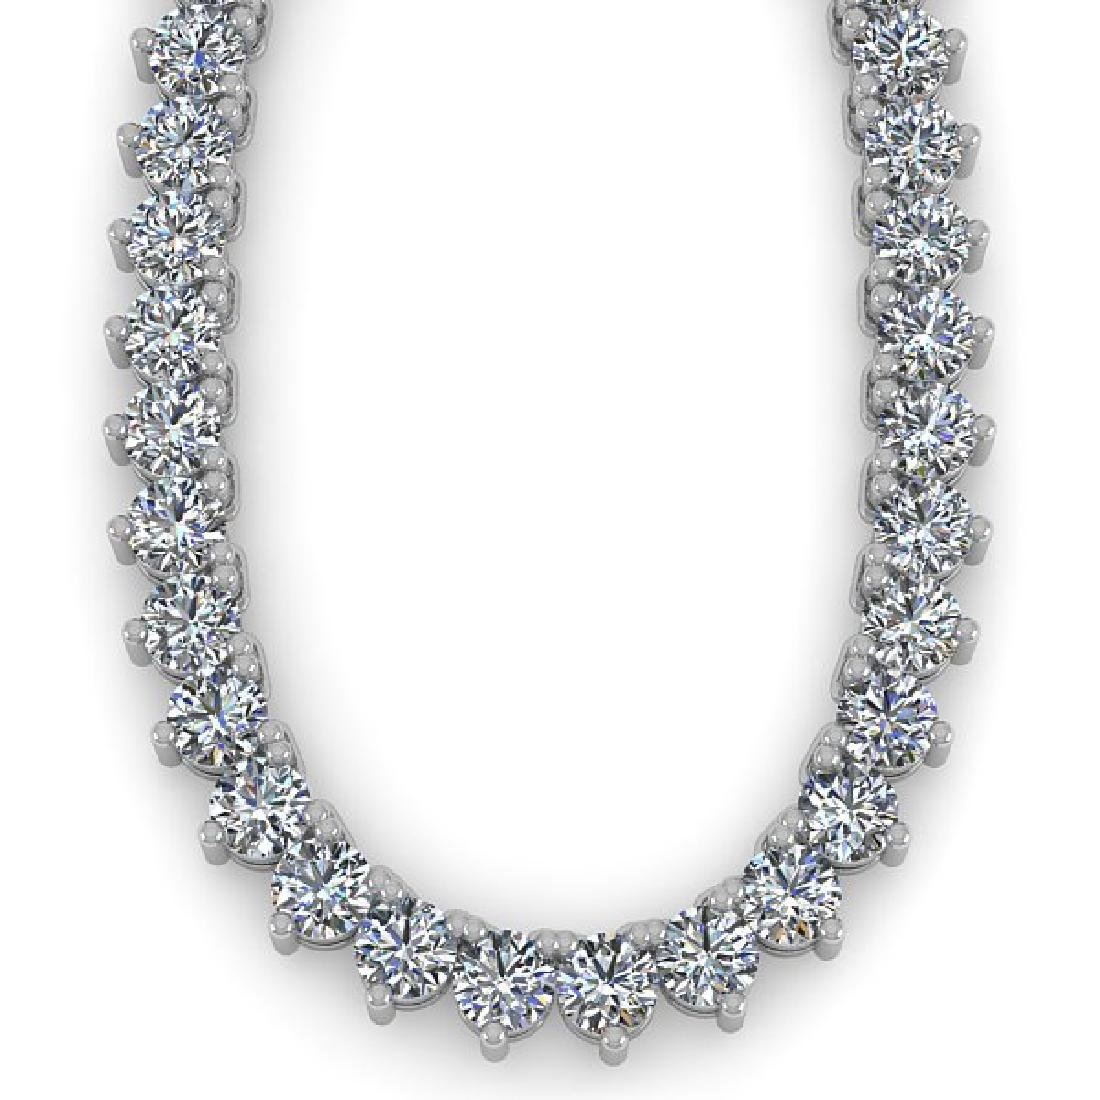 25 CTW Solitaire VS/SI Diamond Necklace 18K White Gold - 2